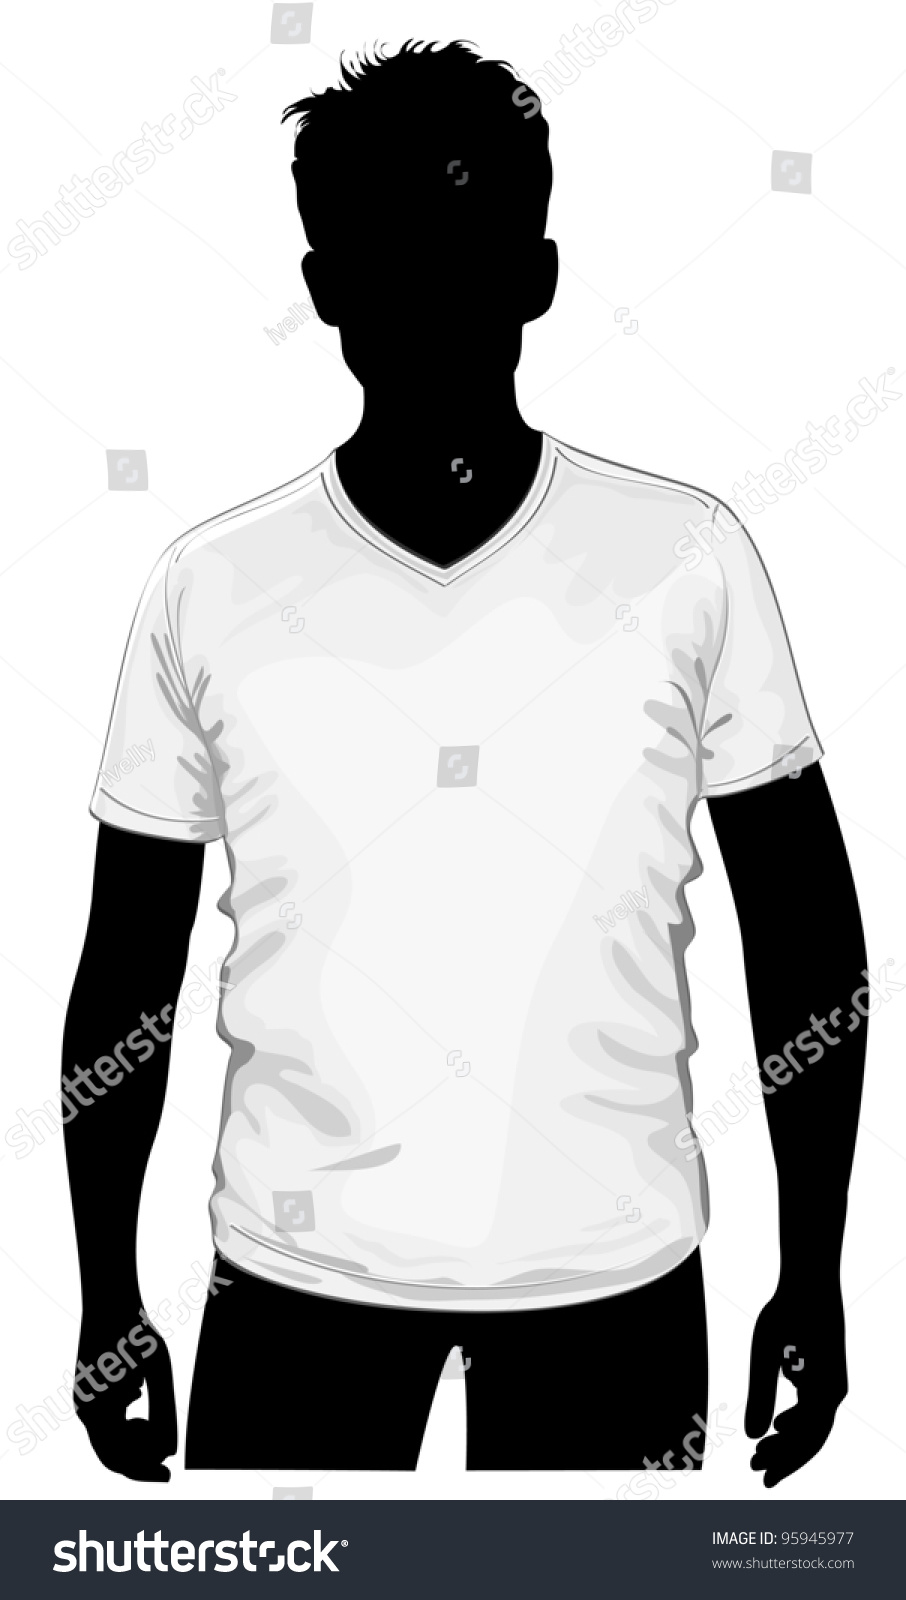 Vector Mens Vneck Tshirt Template Human Stock Vector 95945977 ...